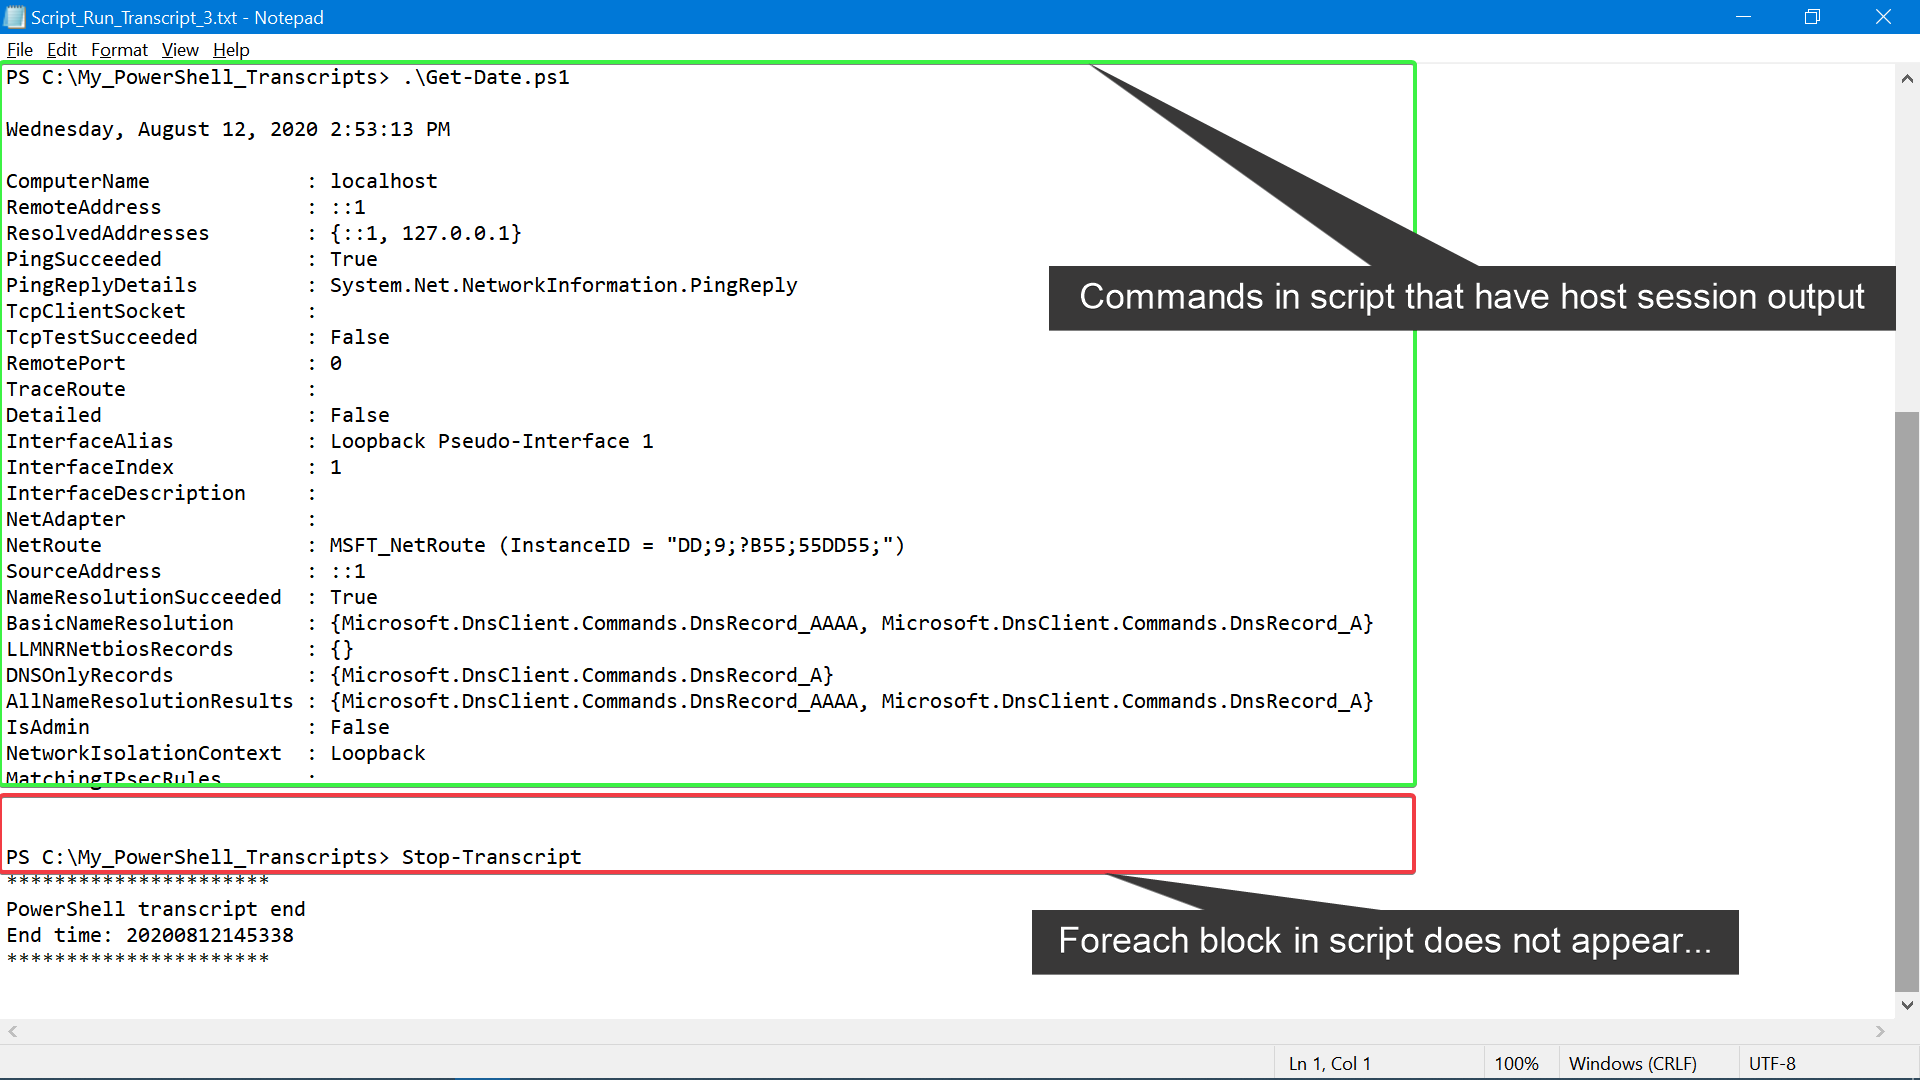 Example PowerShell transcript